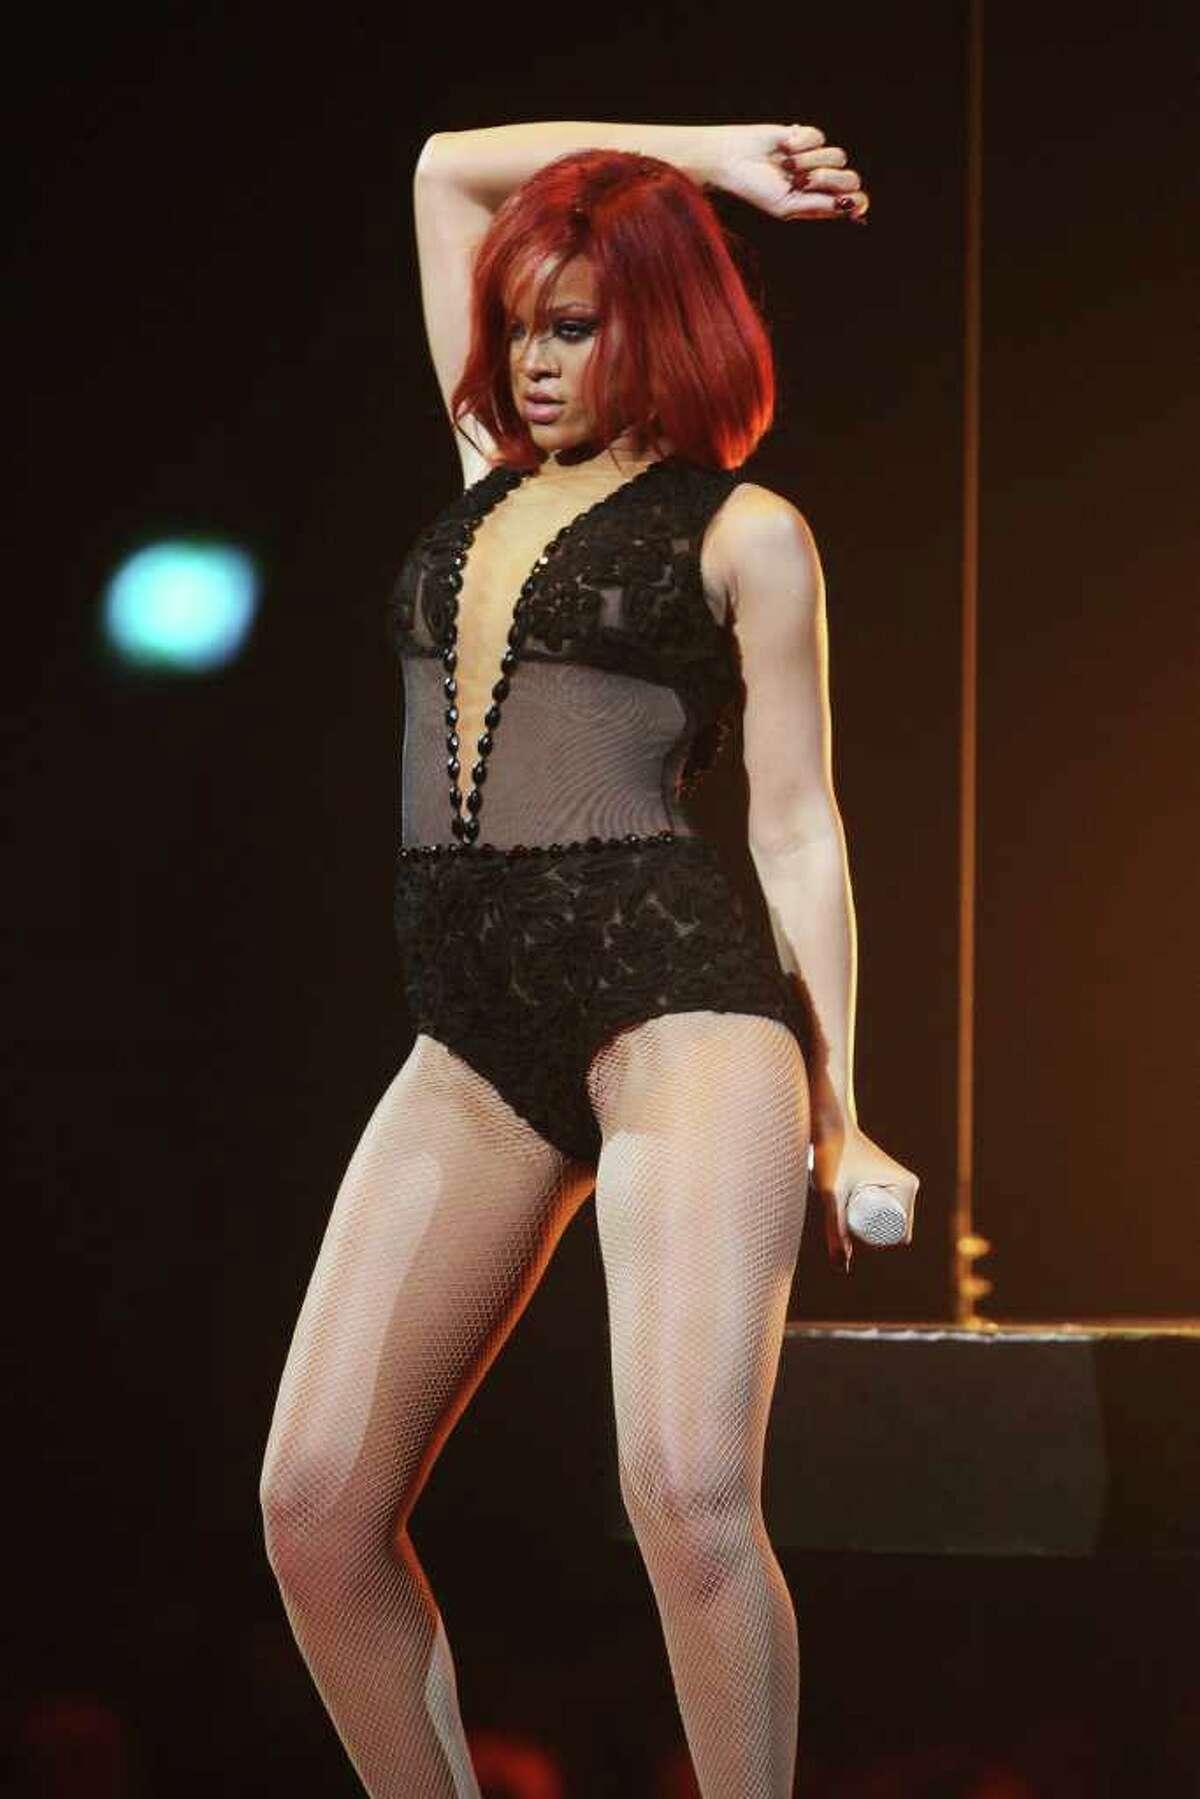 Rihanna is 24.